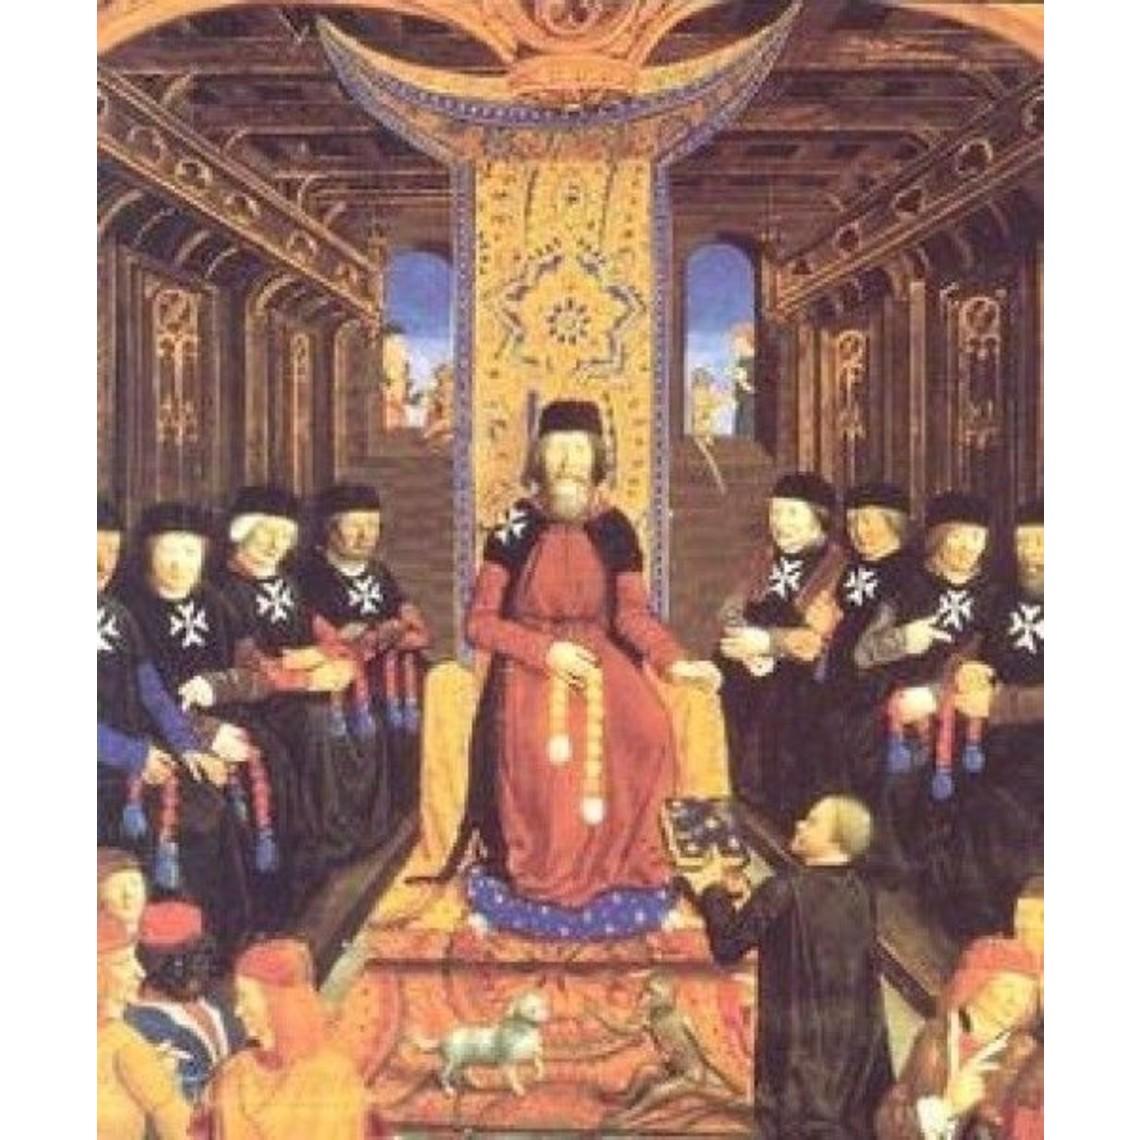 Ulfberth Sobrevesta Hospitalario historica